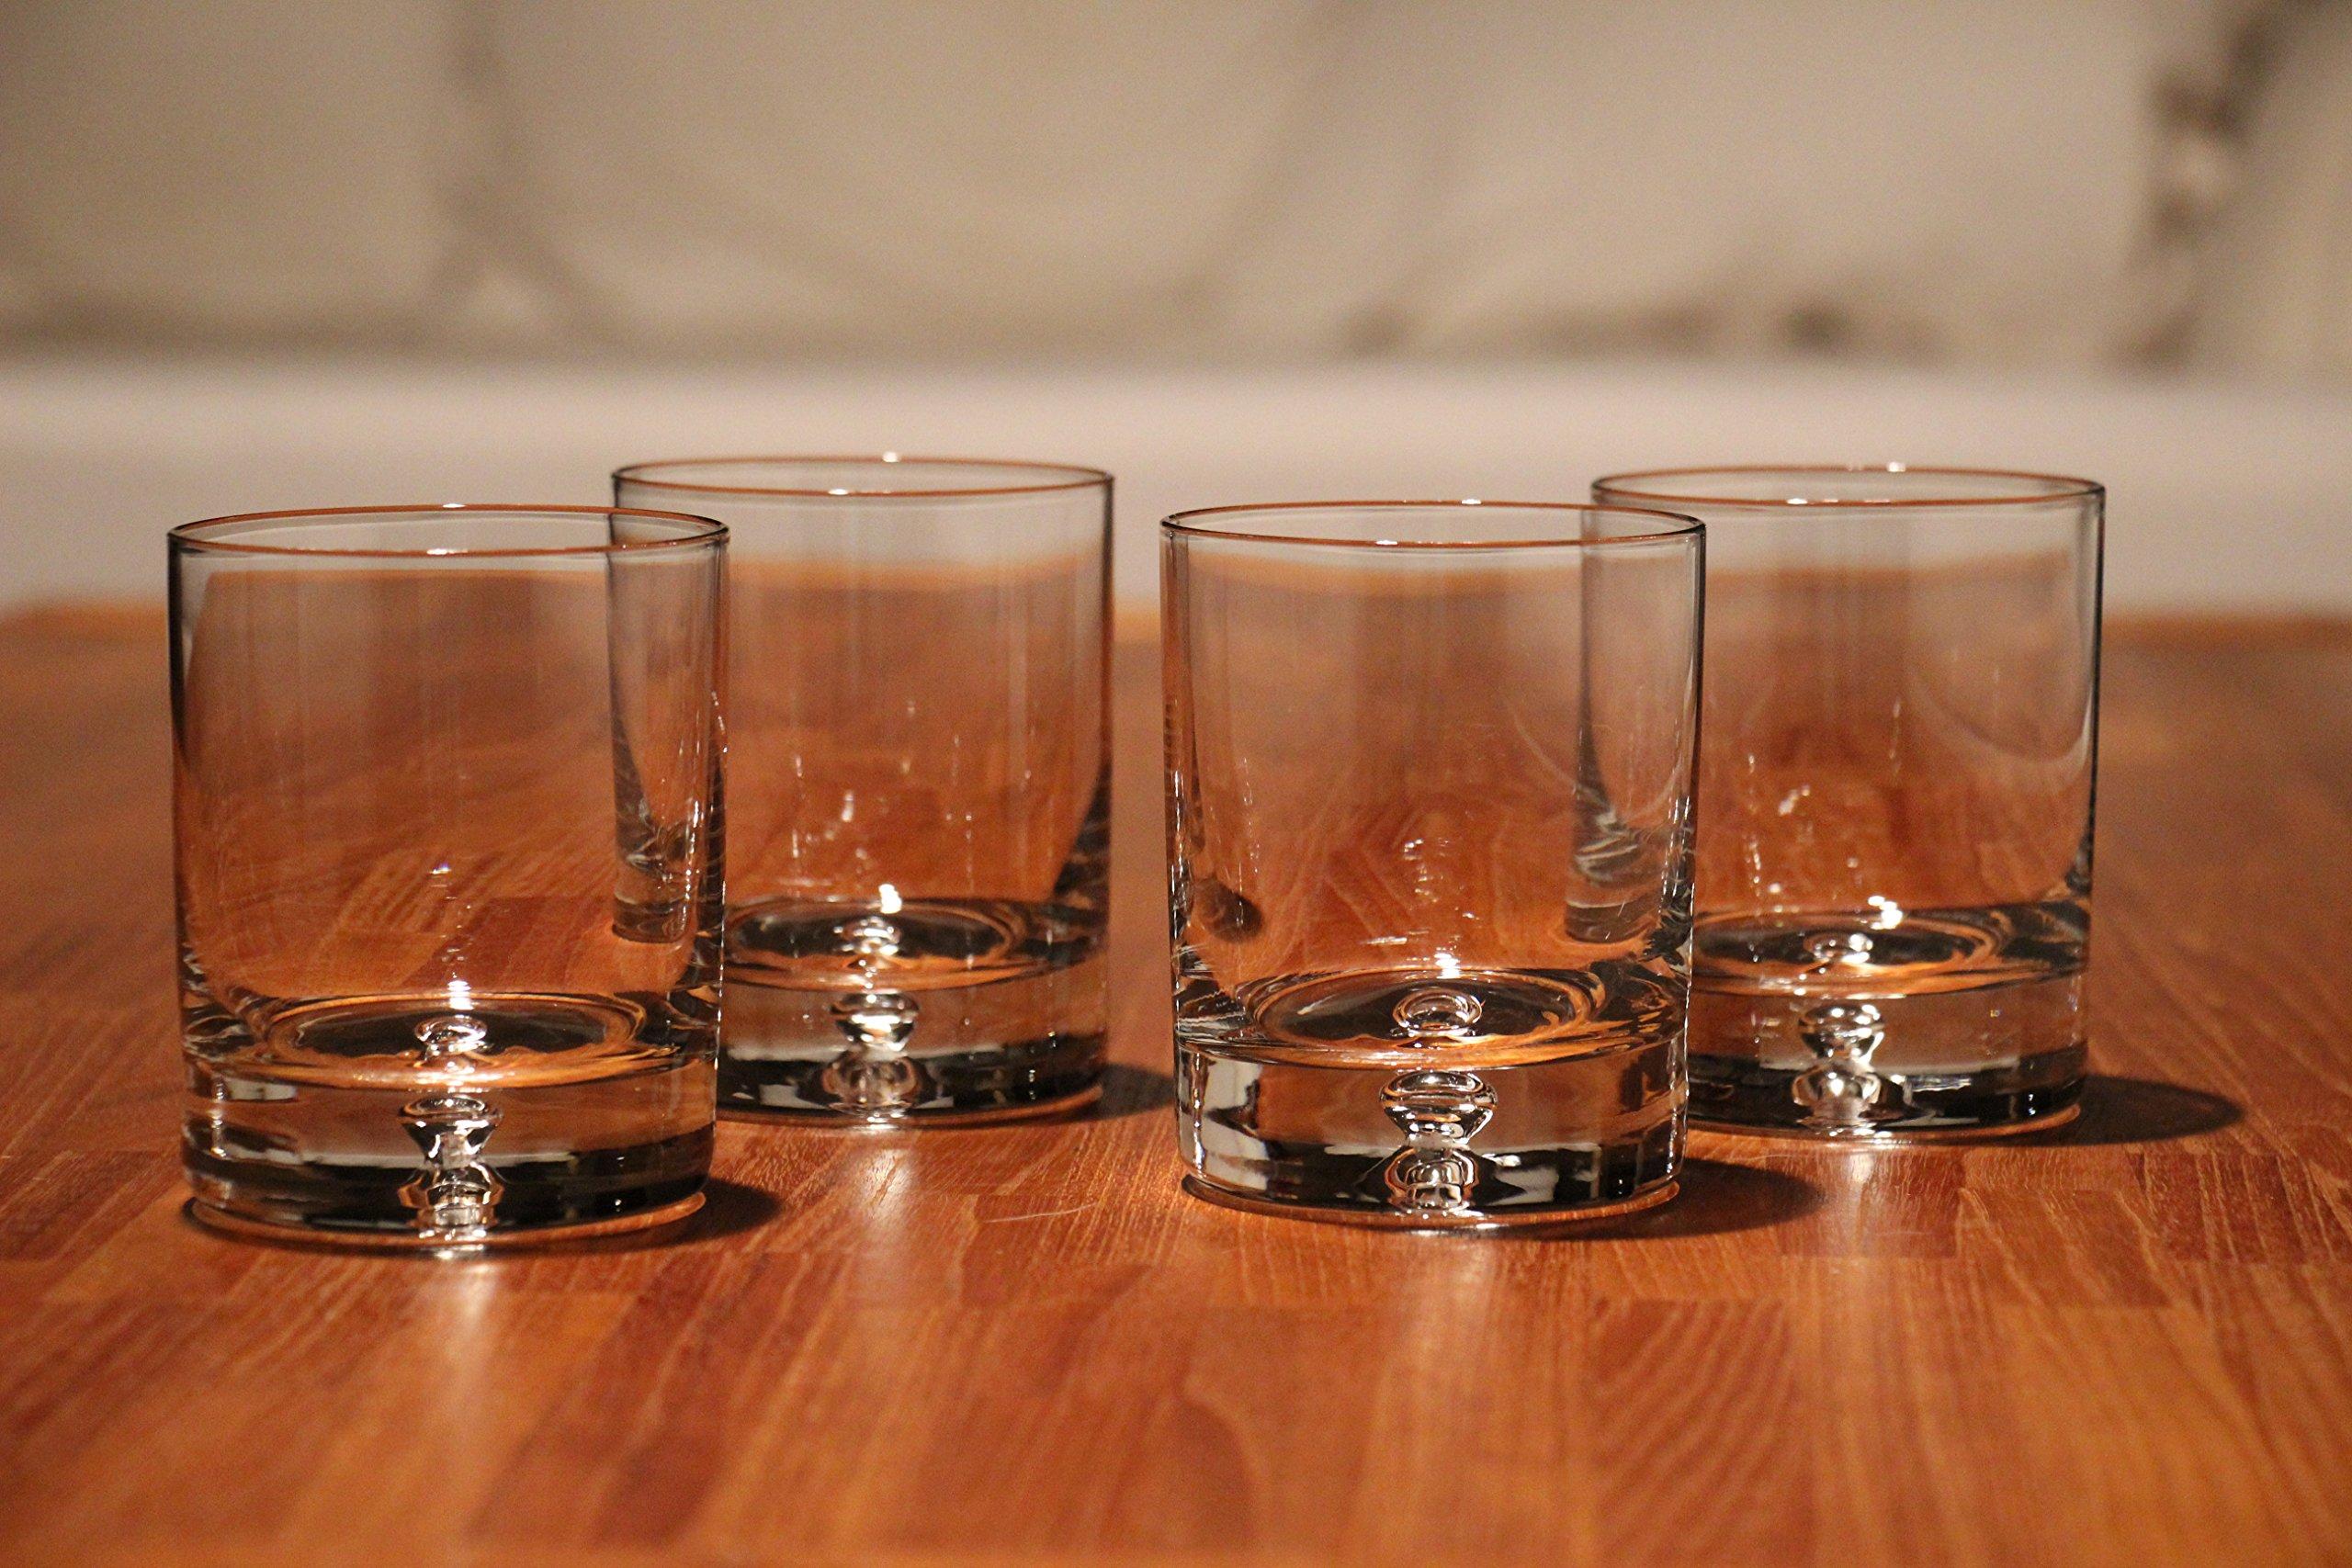 Ravenscroft Crystal Kensington Decanter Set. Handmade European Lead-free Crystal